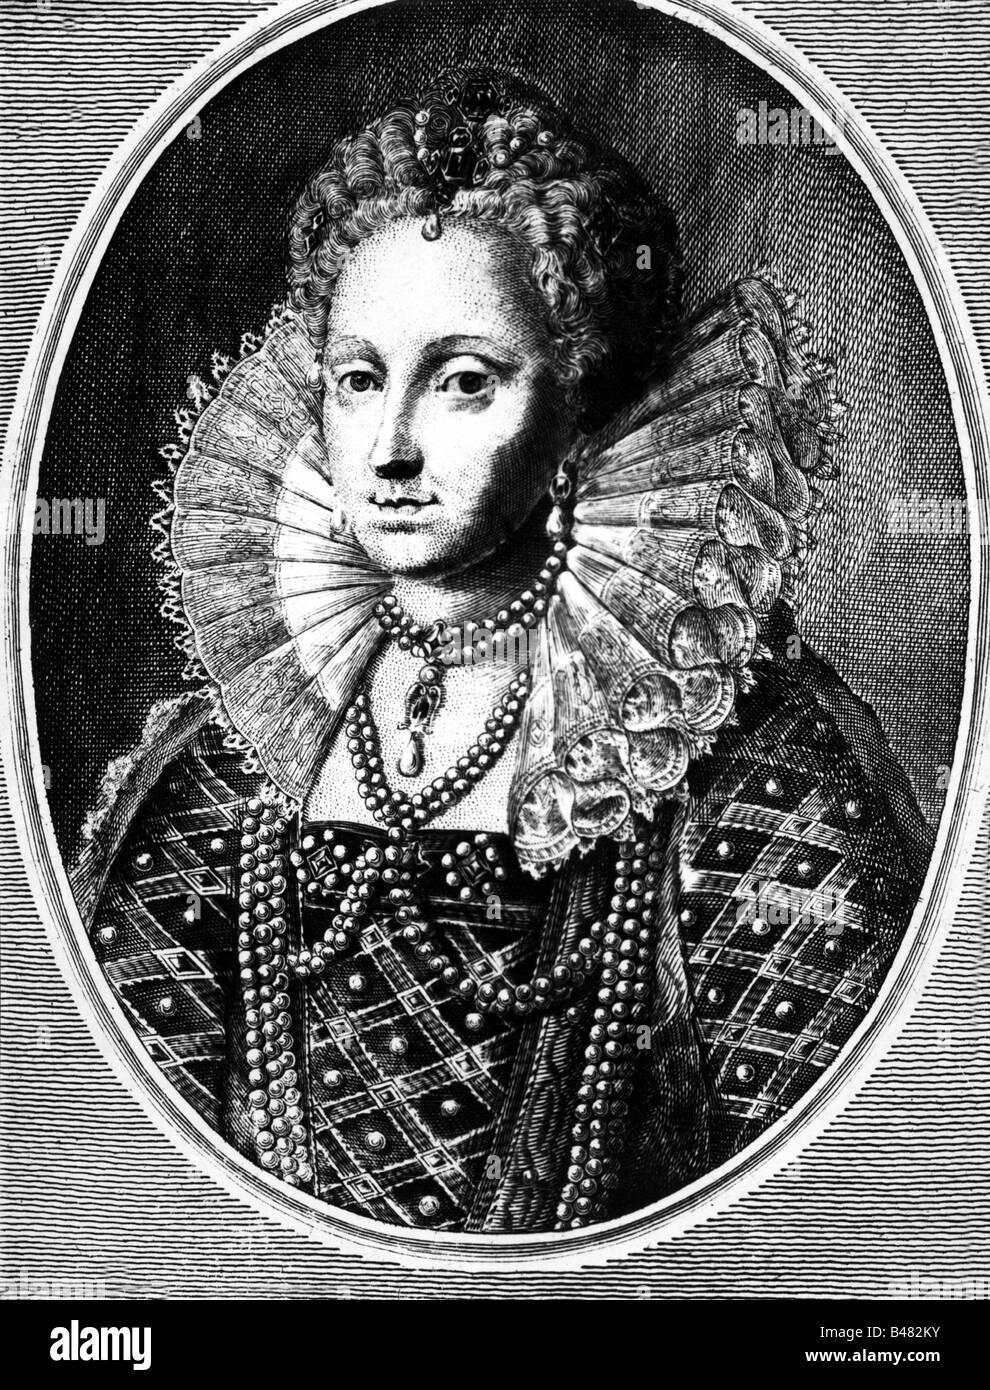 Elizabeth I, 7.9.1533 - 24.3.1603, Queen of England since 17.11.1558, portrait, copper engraving, circa 16th century, - Stock Image